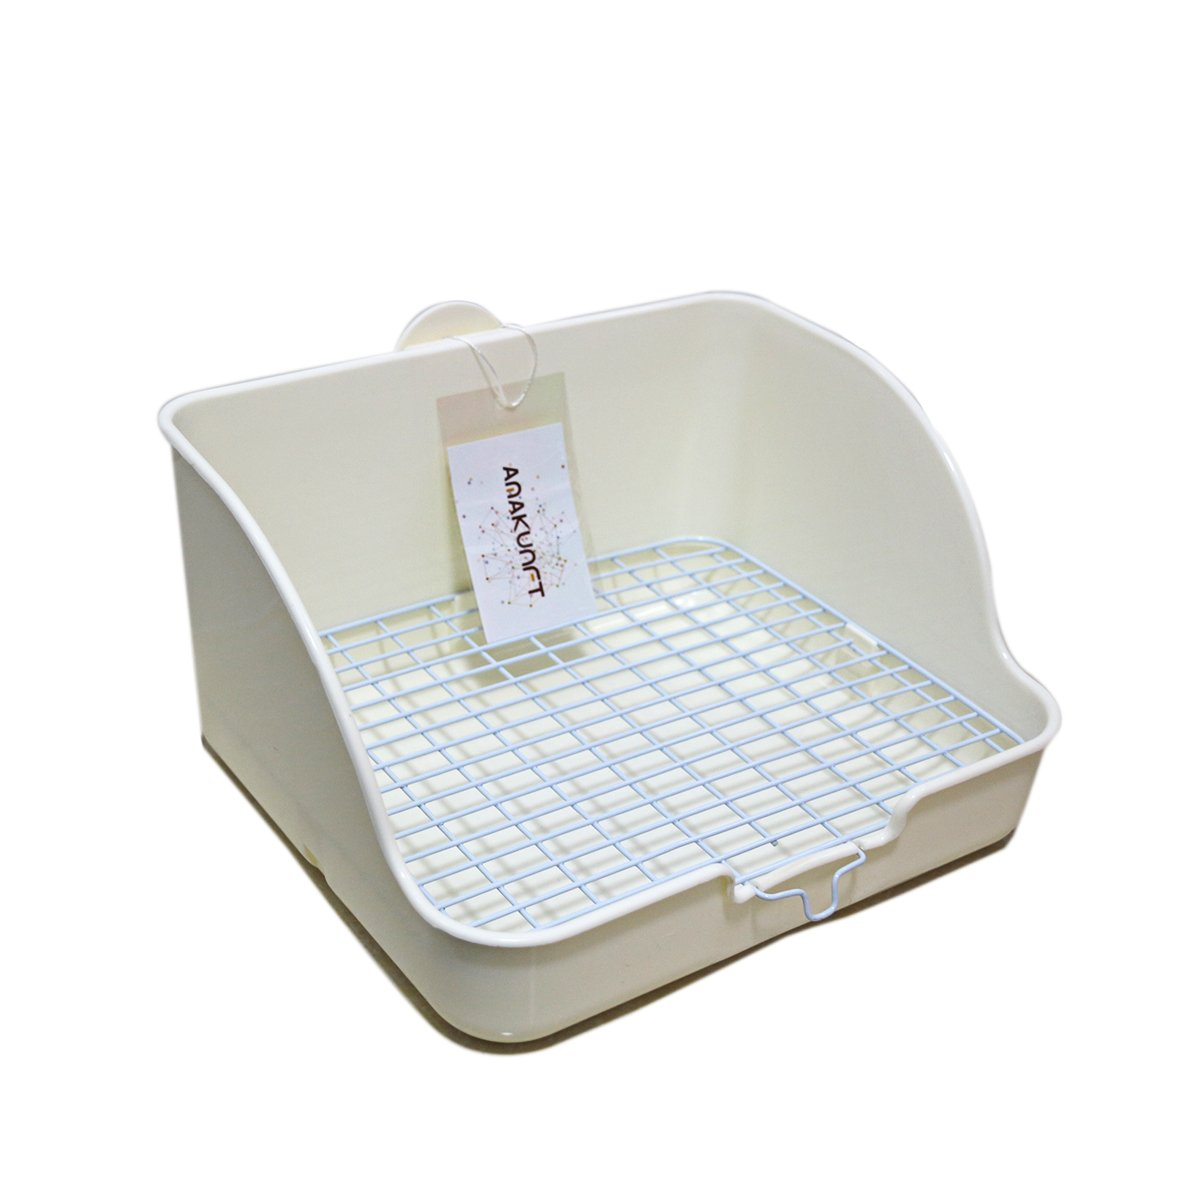 HongYH Pet Small Rat Toilet, Square Potty Trainer Corner Litter Bedding Box Pet Pan for Small Animal/rabbit/guinea Pig/galesaur/ferret(Grey) by HongYH (Image #2)